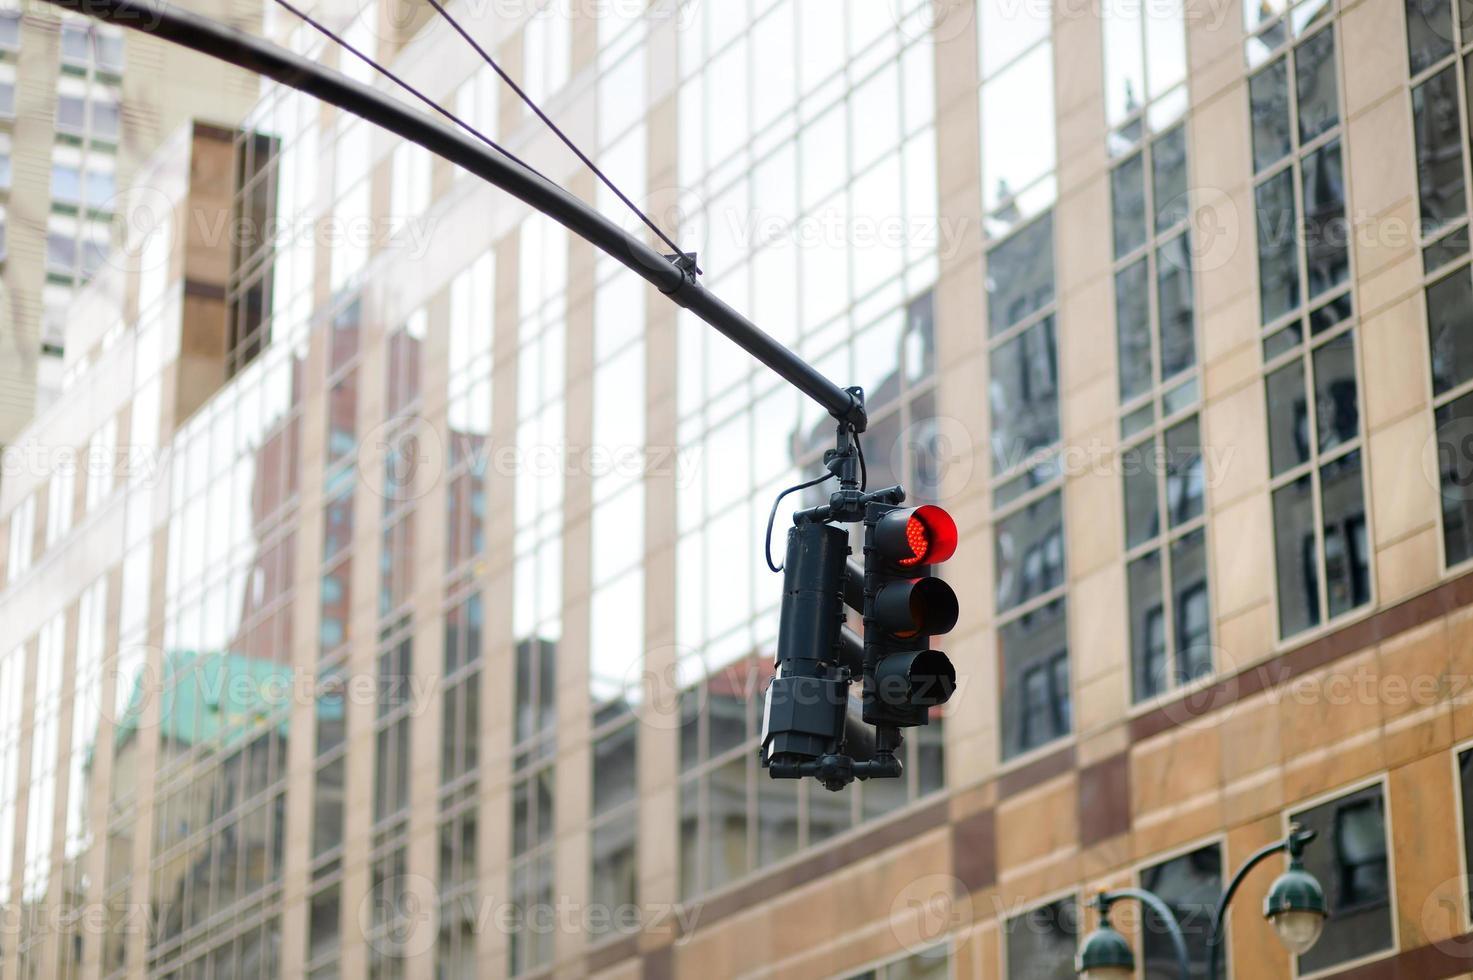 New York city traffic lights photo